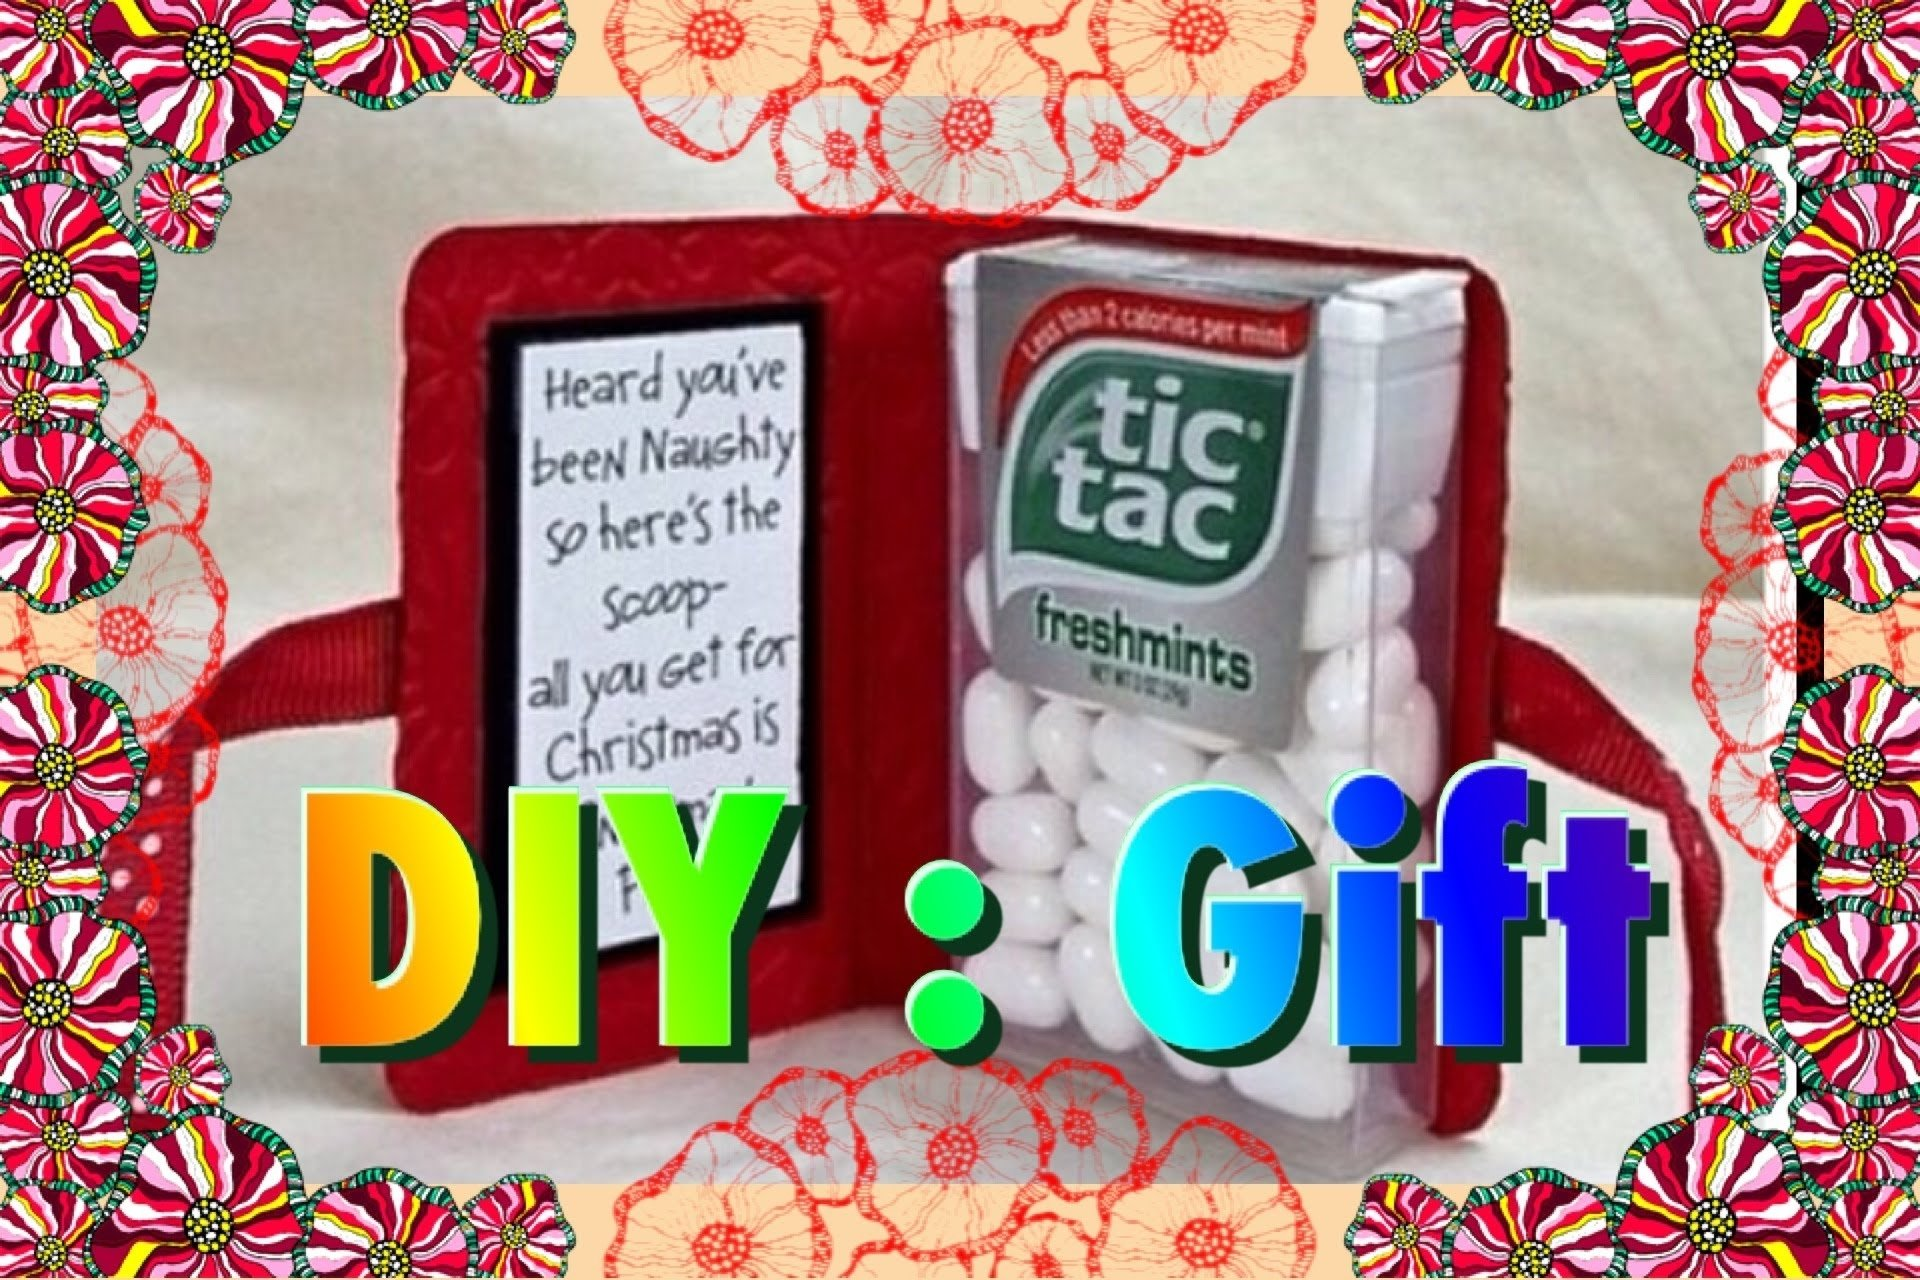 10 Cute Last Minute Homemade Christmas Gift Ideas diy last minute funny and cute christmas gift snowman poop youtube 4 2020